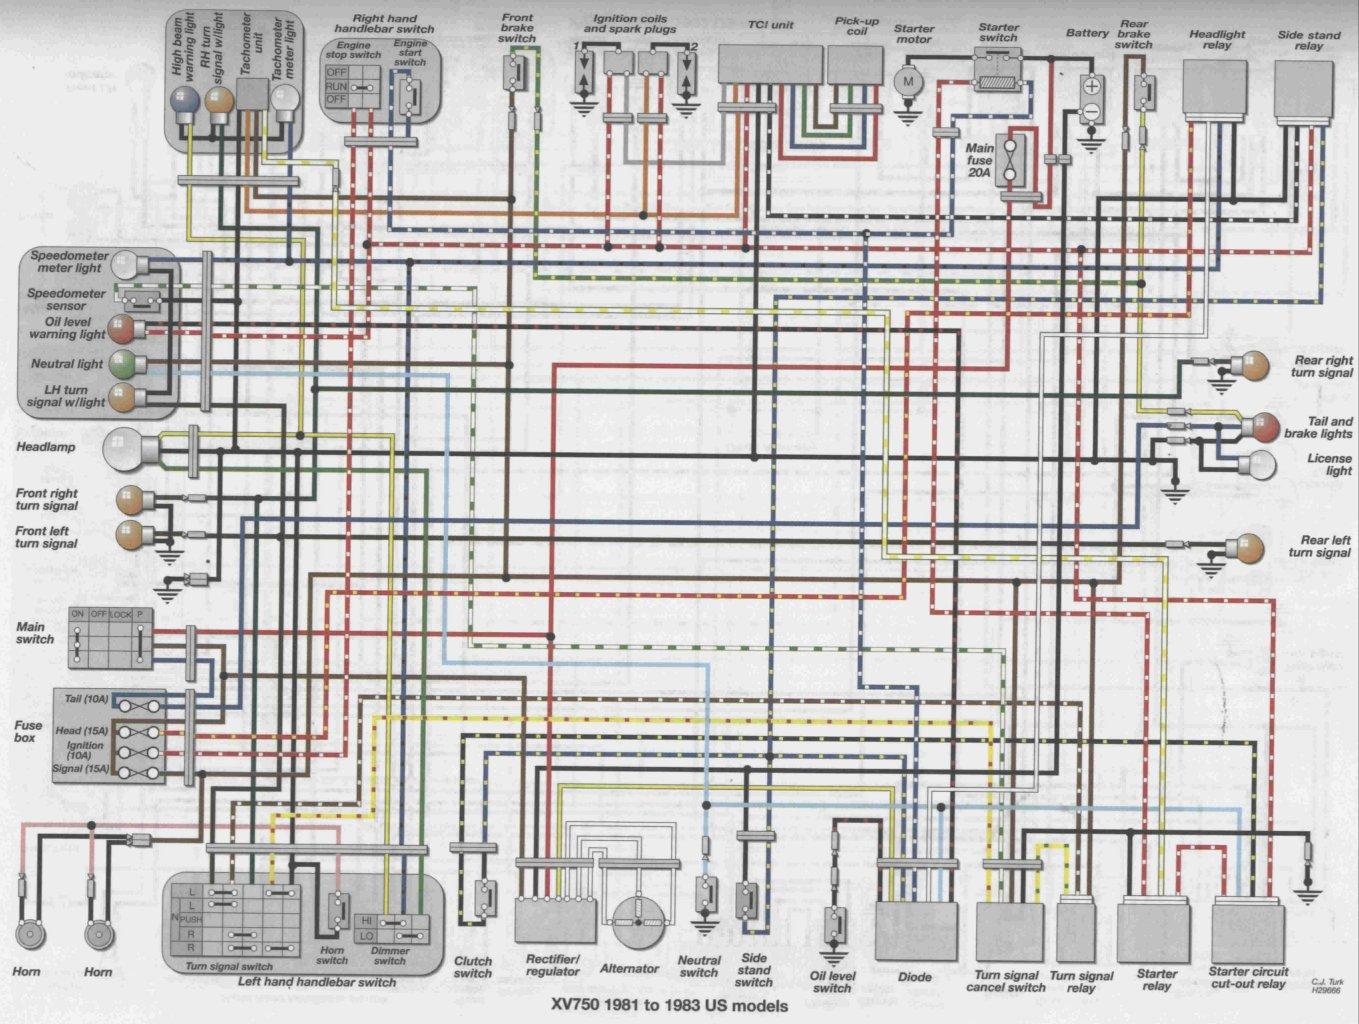 xv920 wiring diagram xj550 wiring diagram wiring diagram